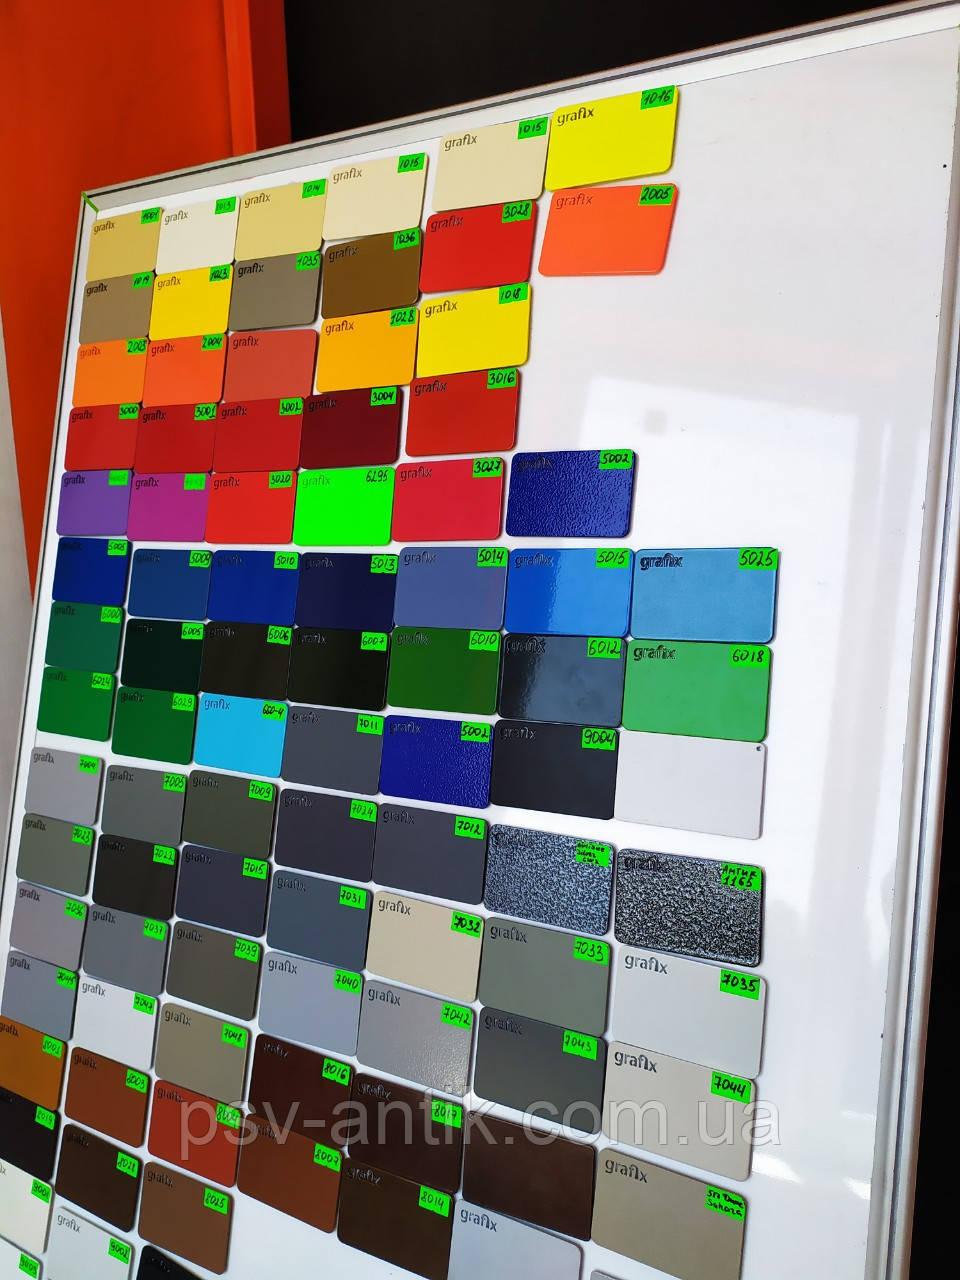 Порошковая краска глянцевая, полиэфирная, архитектурная, 6012